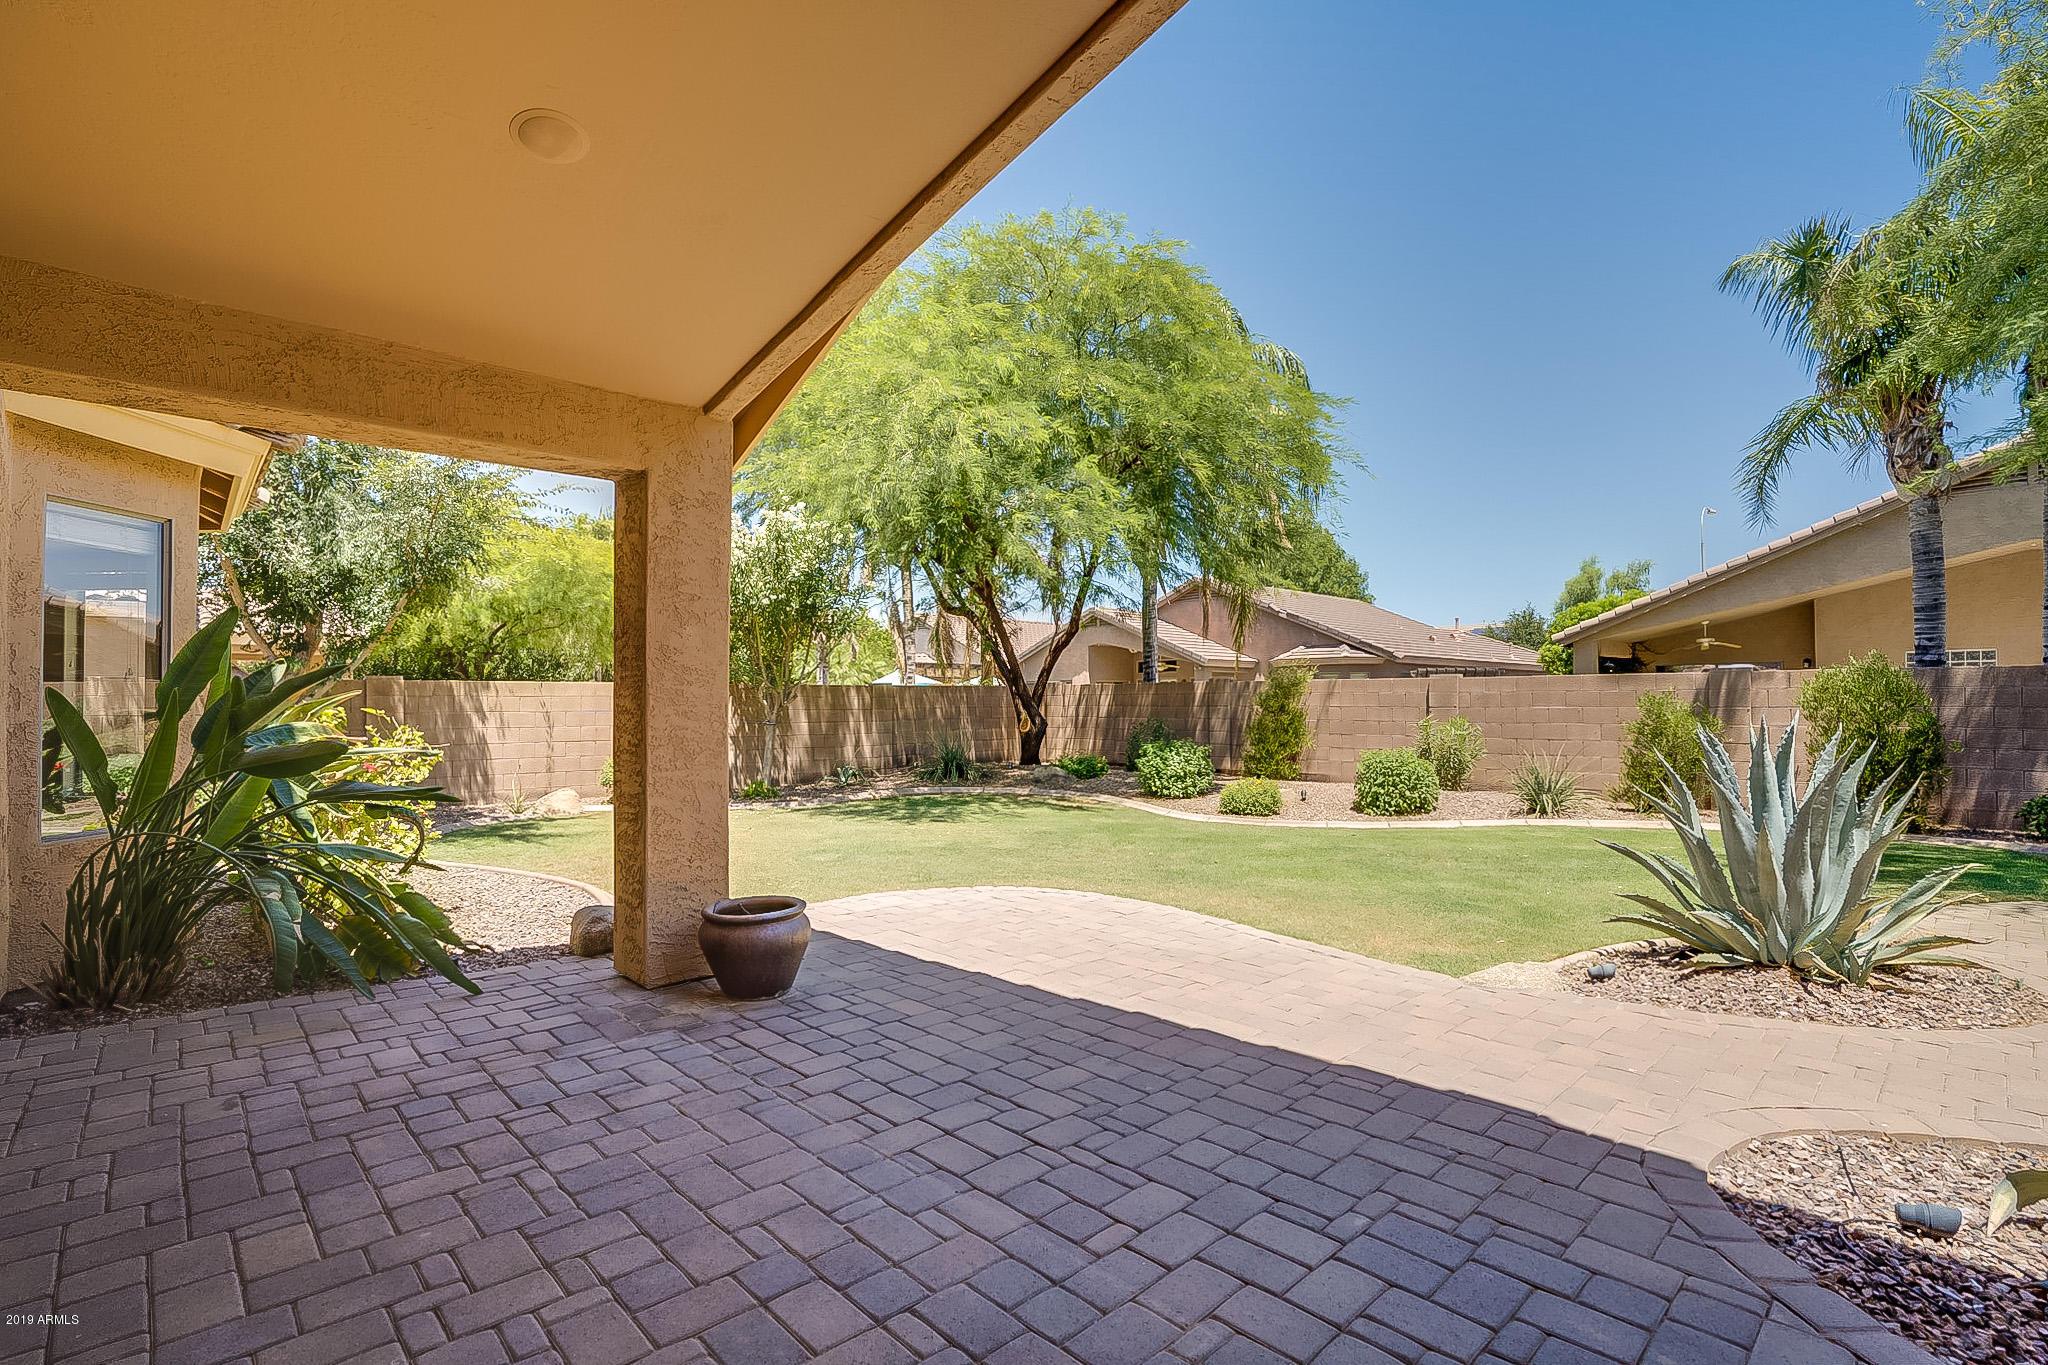 MLS 5944753 290 W CARDINAL Way, Chandler, AZ 85286 Carino Estates